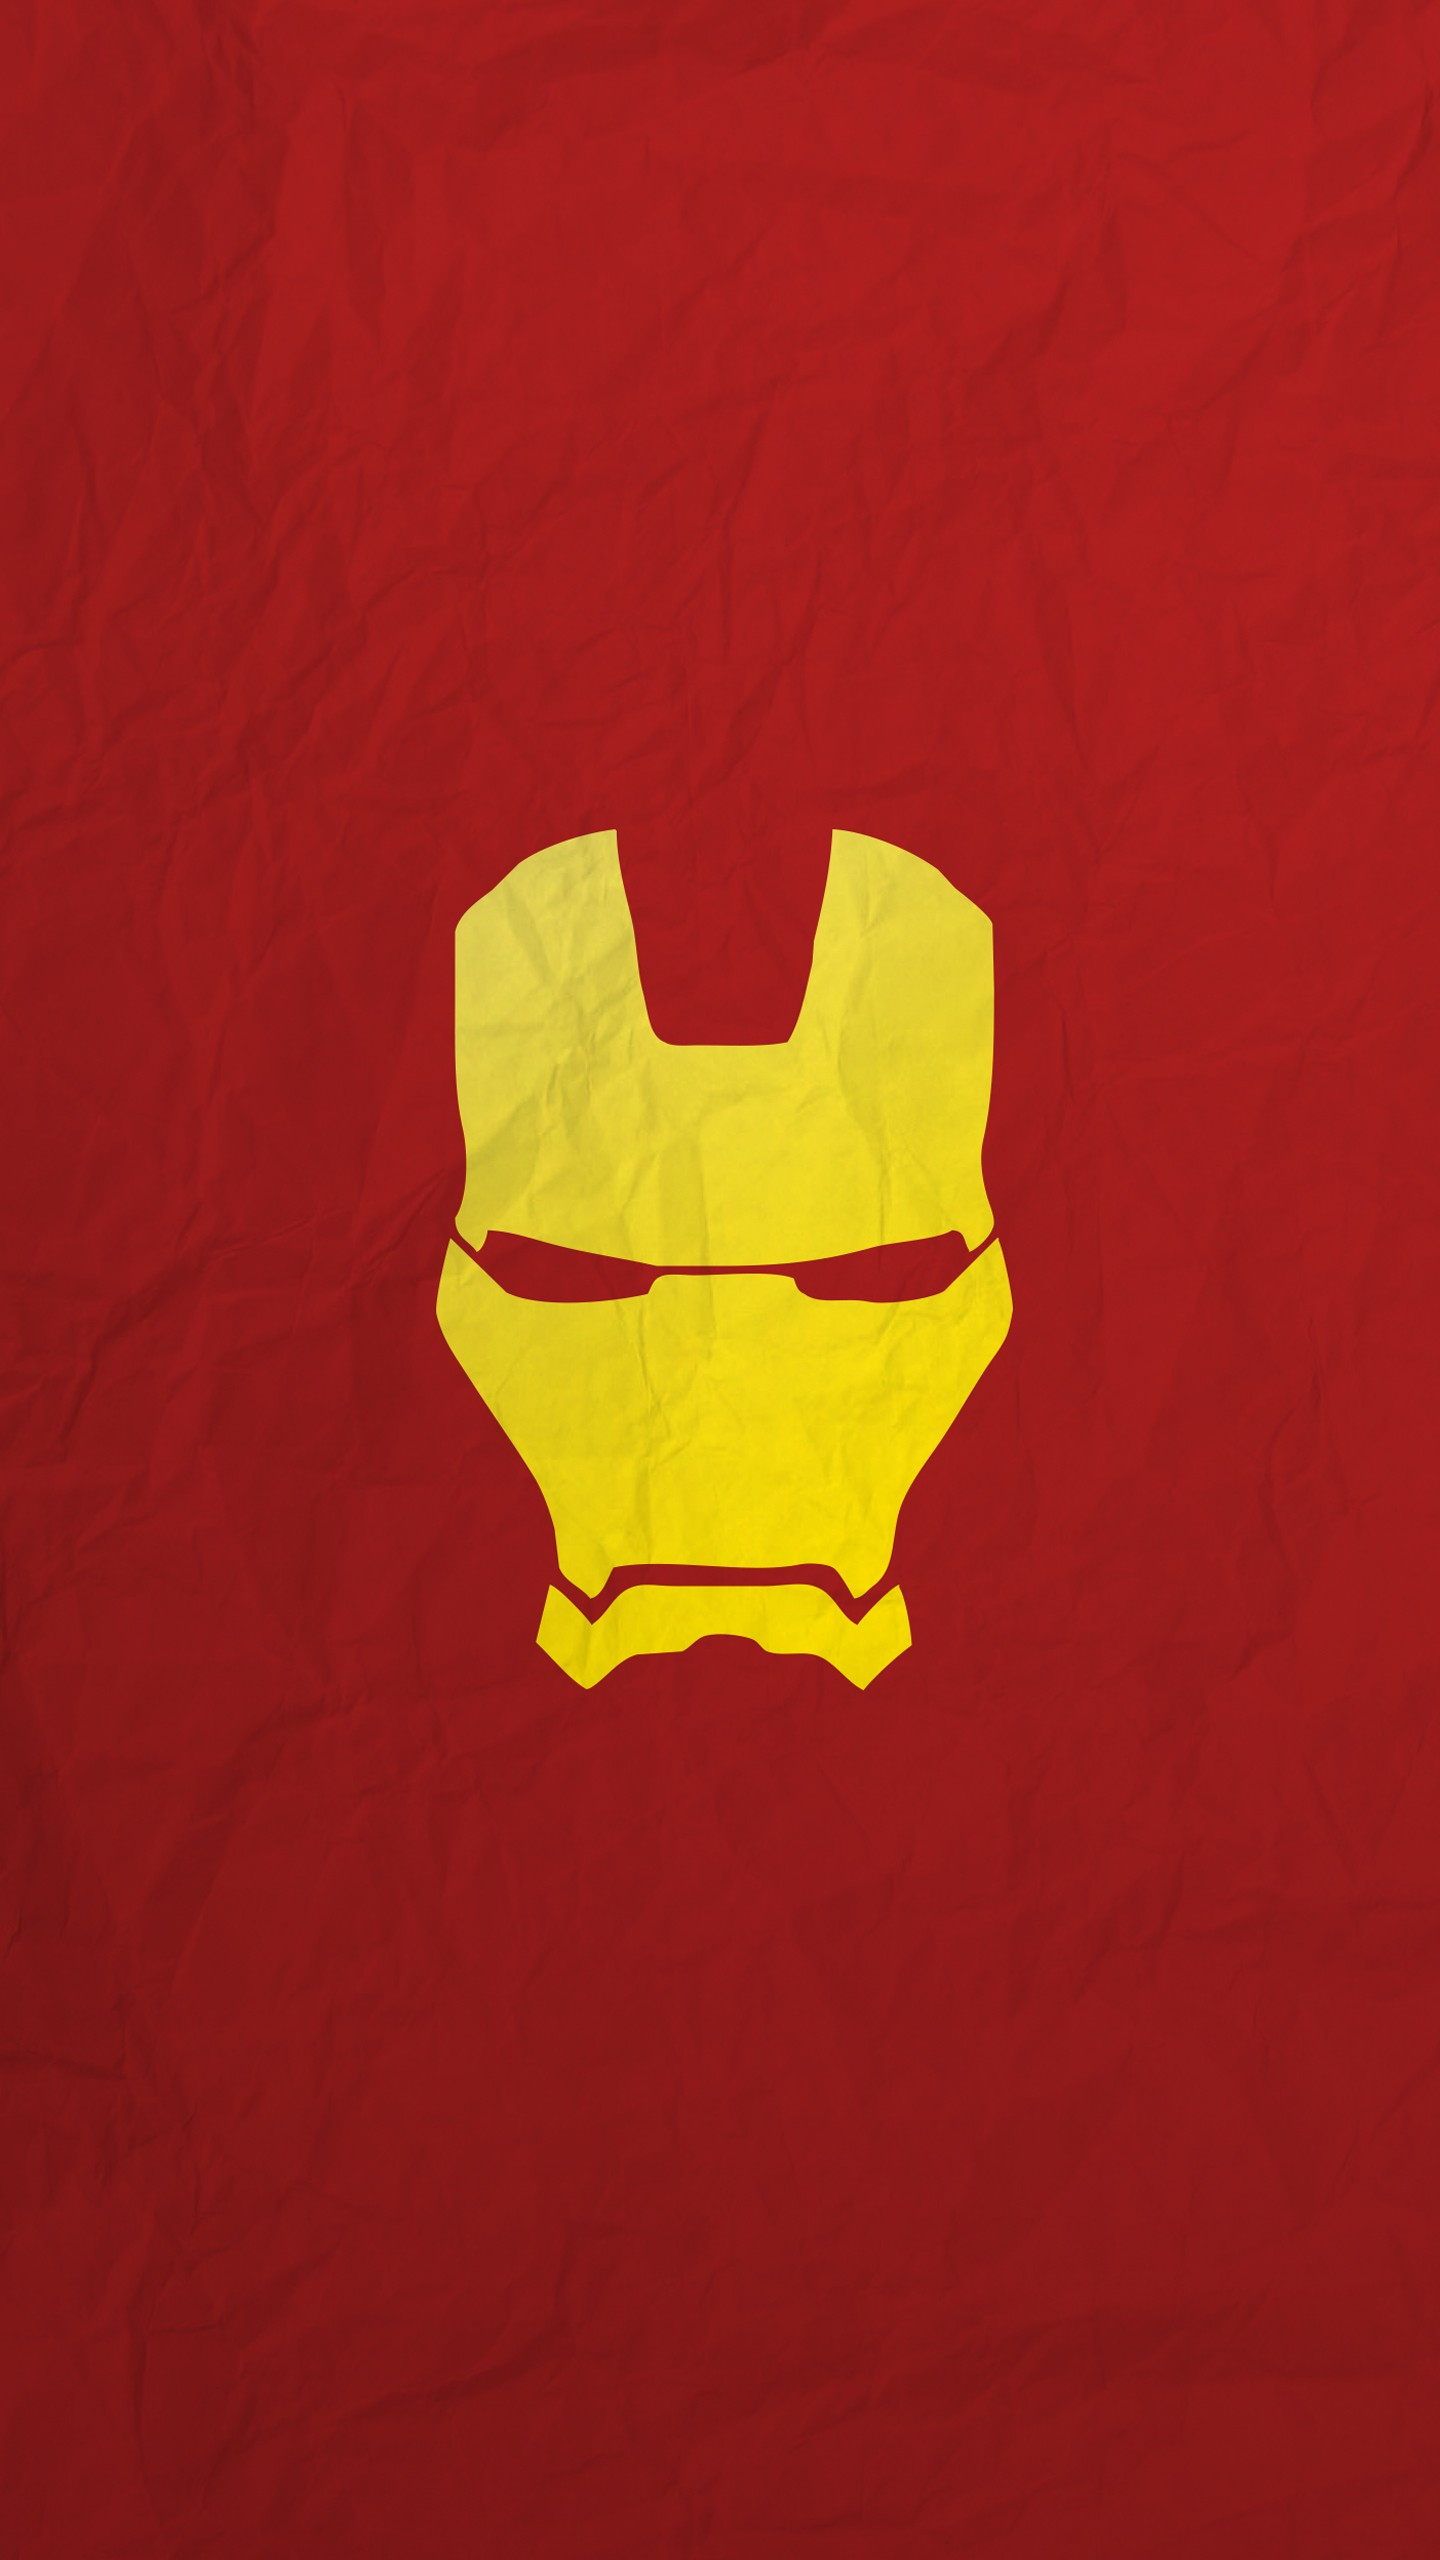 superhero wallpaper 03 - [1440x2560]